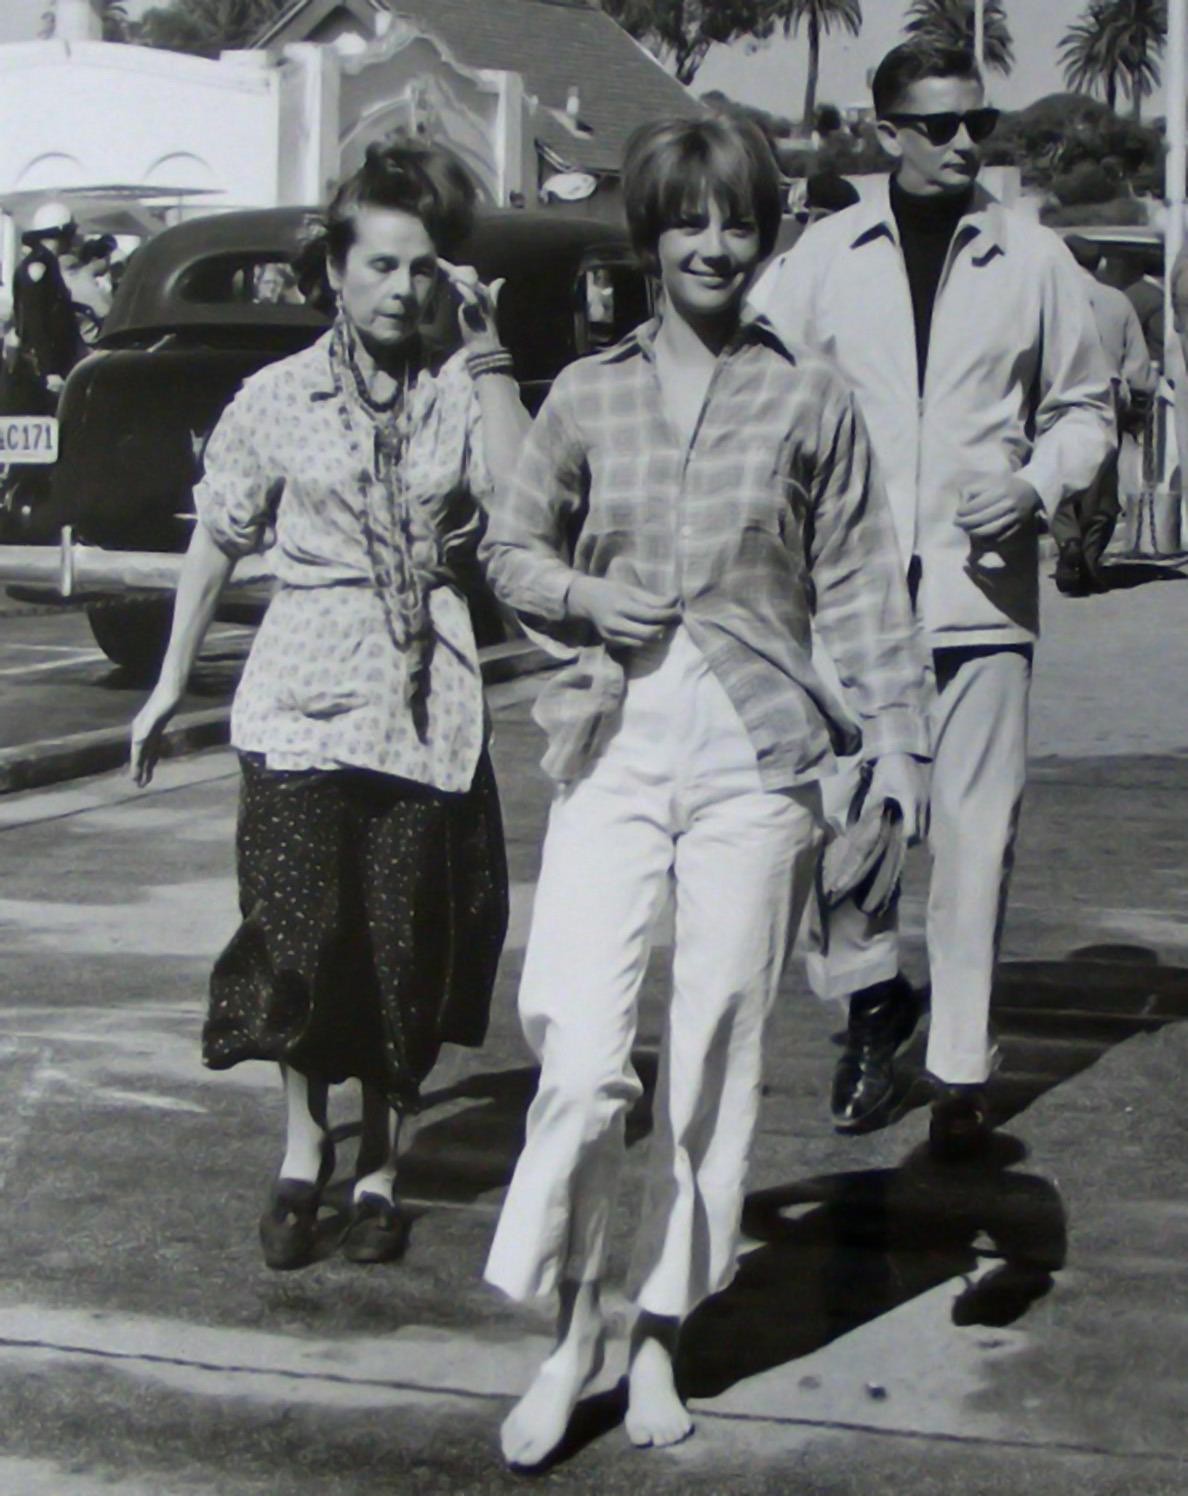 https://pics.wikifeet.com/Natalie-Wood-Feet-1240423.jpg